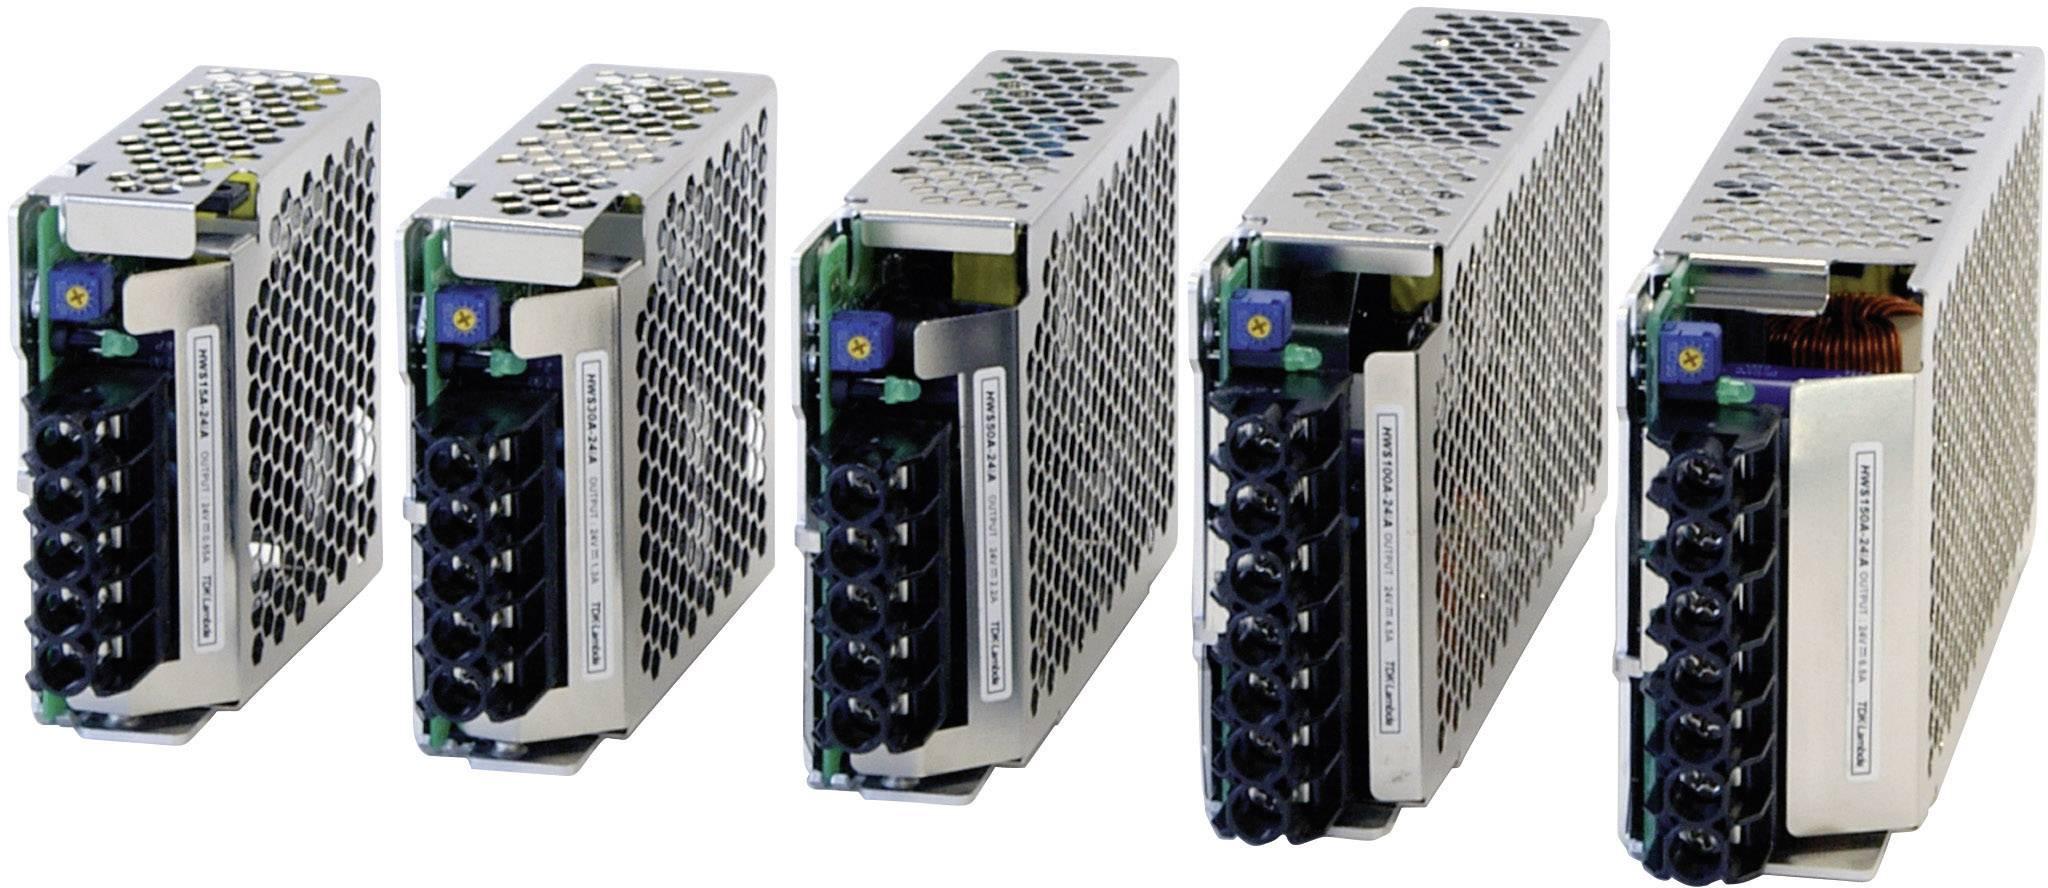 Zabudovateľný napájací zdroj TDK-Lambda HWS-30A-12/A, 12 V, 30 W